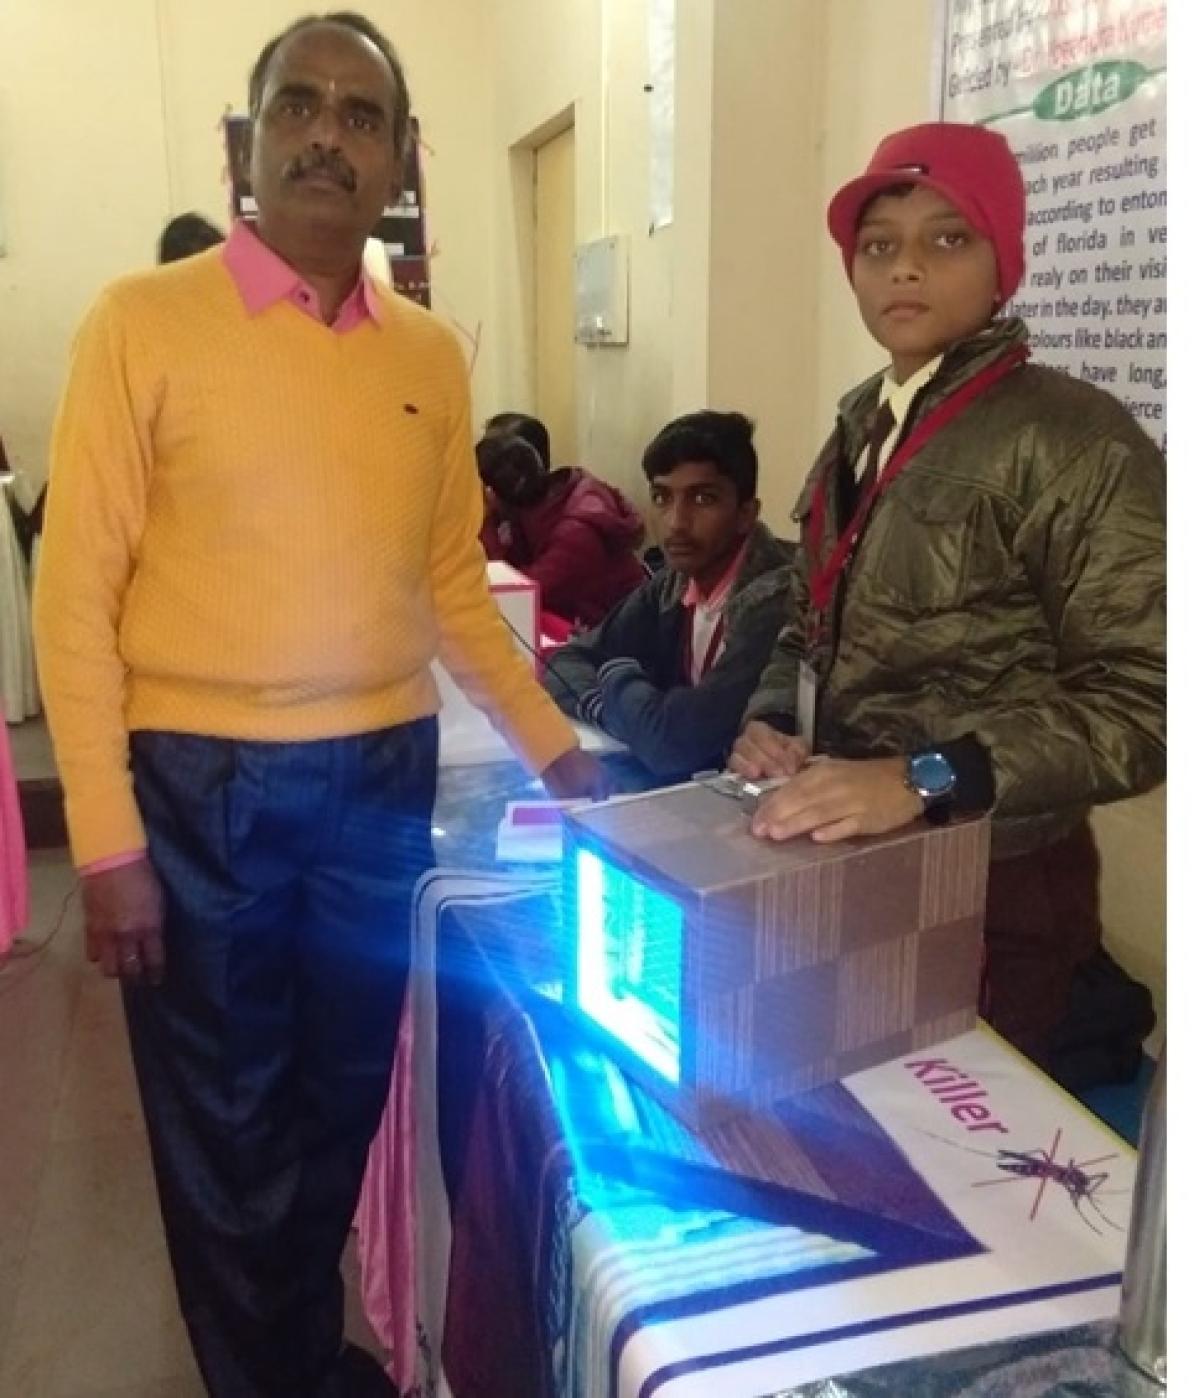 Child scientist Aksha Joshi along with his model and mentor Dr YK Kothari